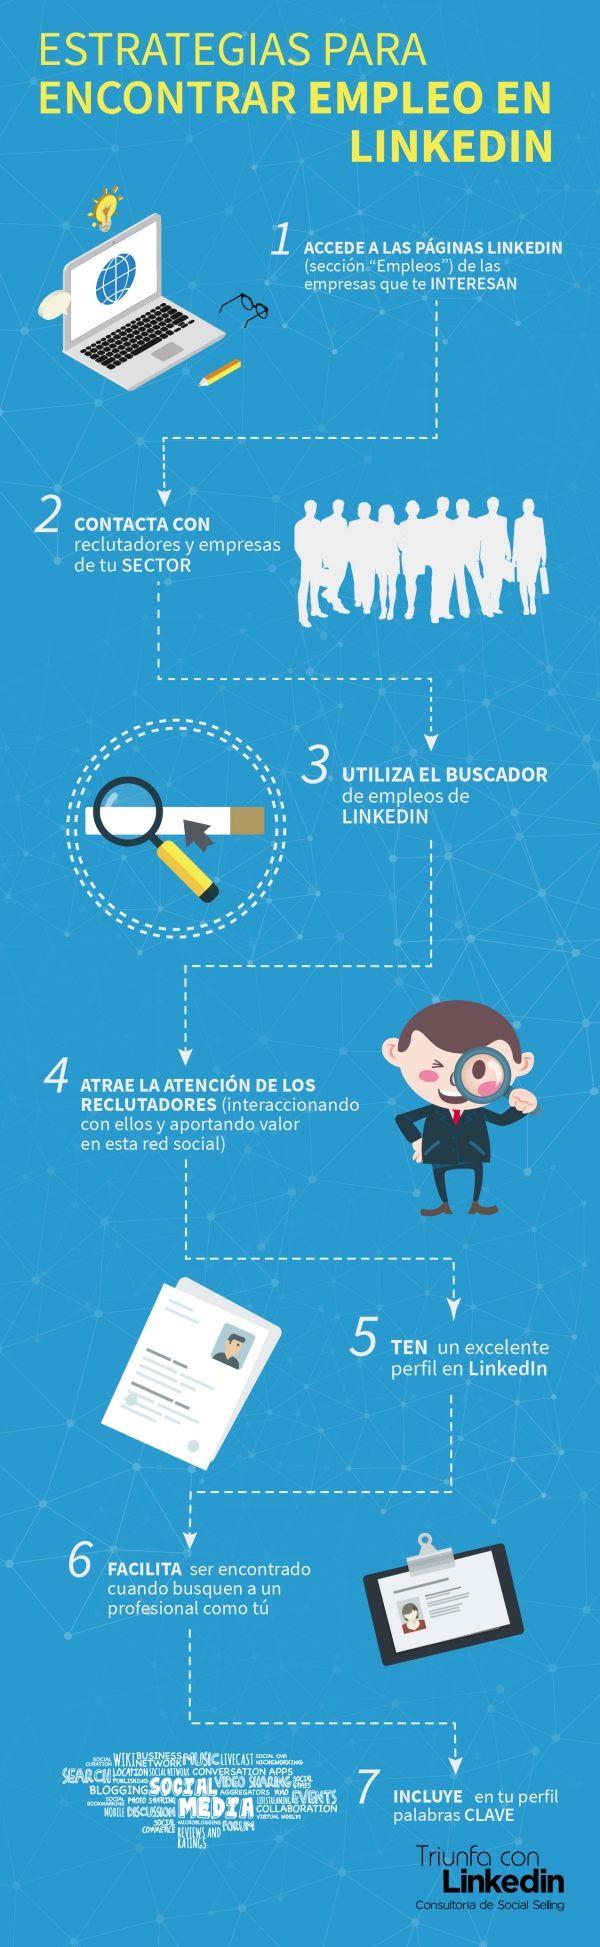 Empleo LinkedIn: Estrategias - Infografía